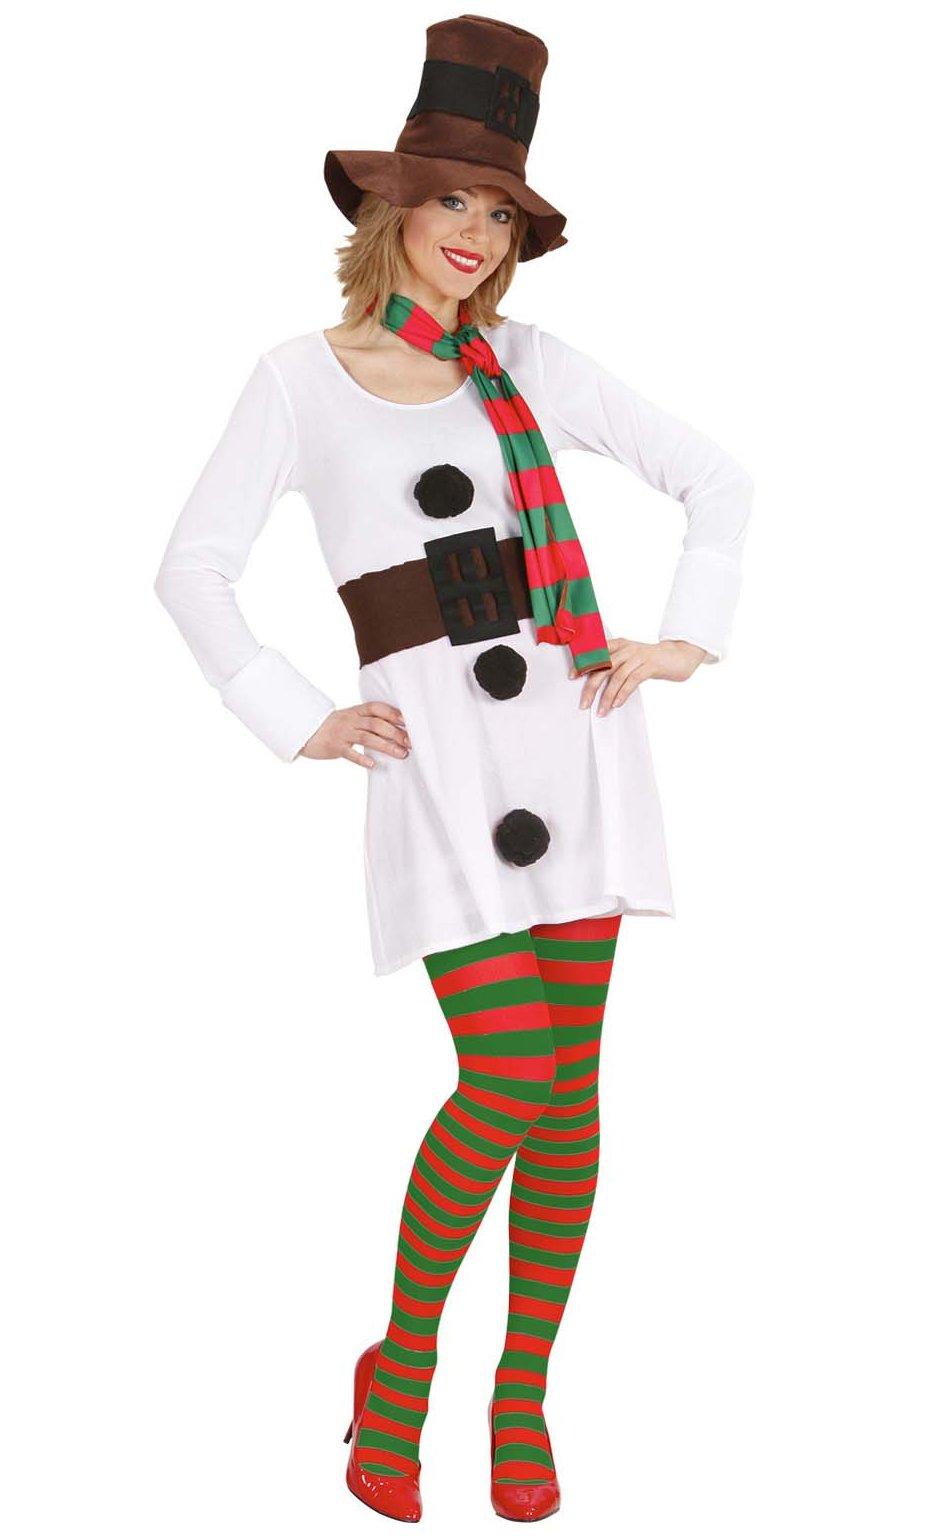 Costume-Bonhomme-de-neige-Femme